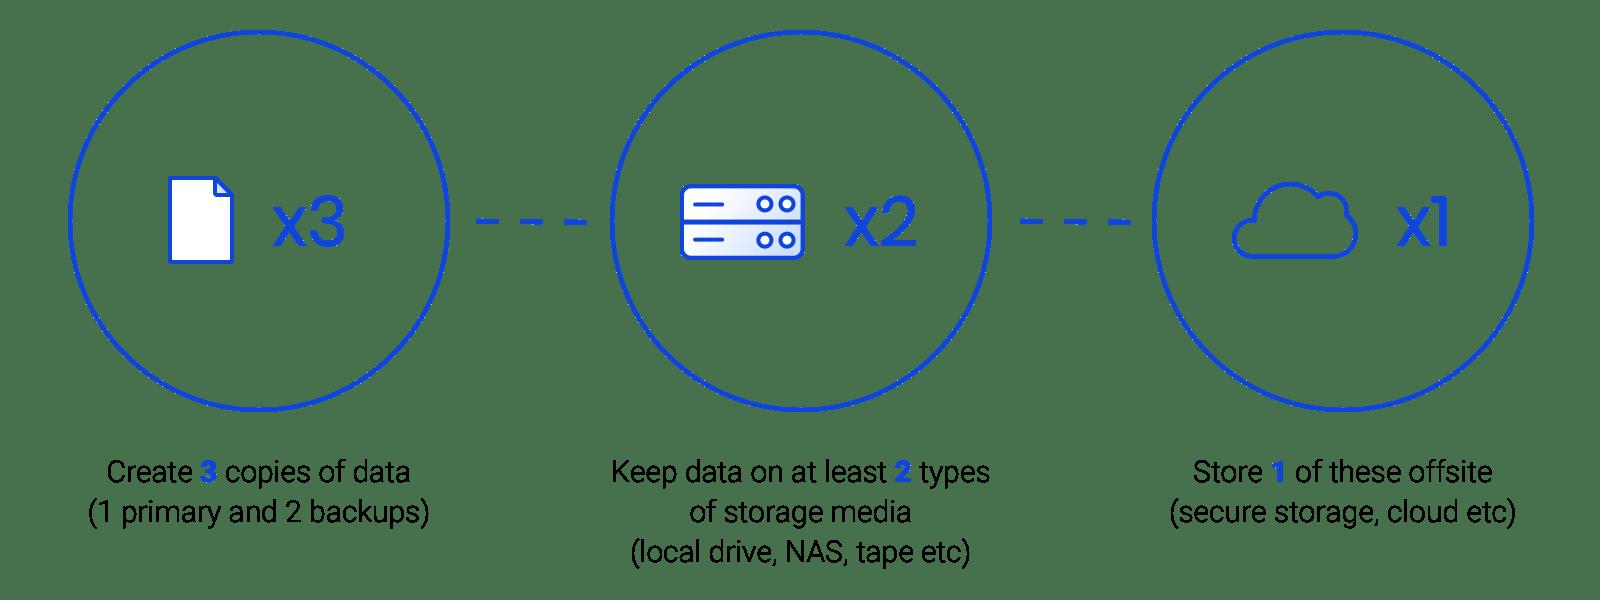 3-2-1-rule-at-cloud-backup